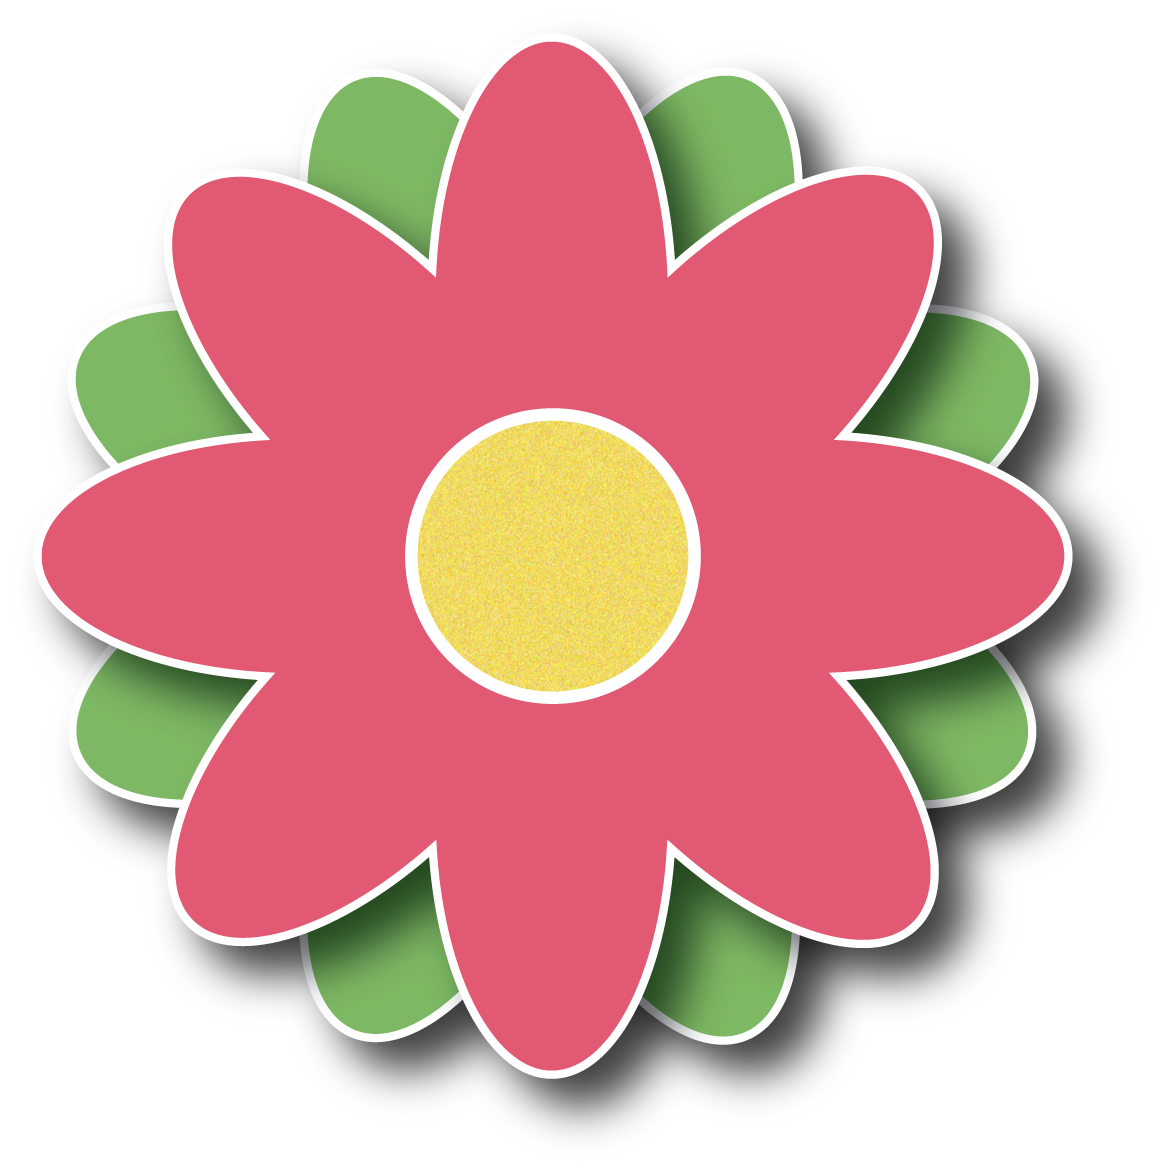 hight resolution of free spring clipart mtleeajta png 1165 1171 summer clipart